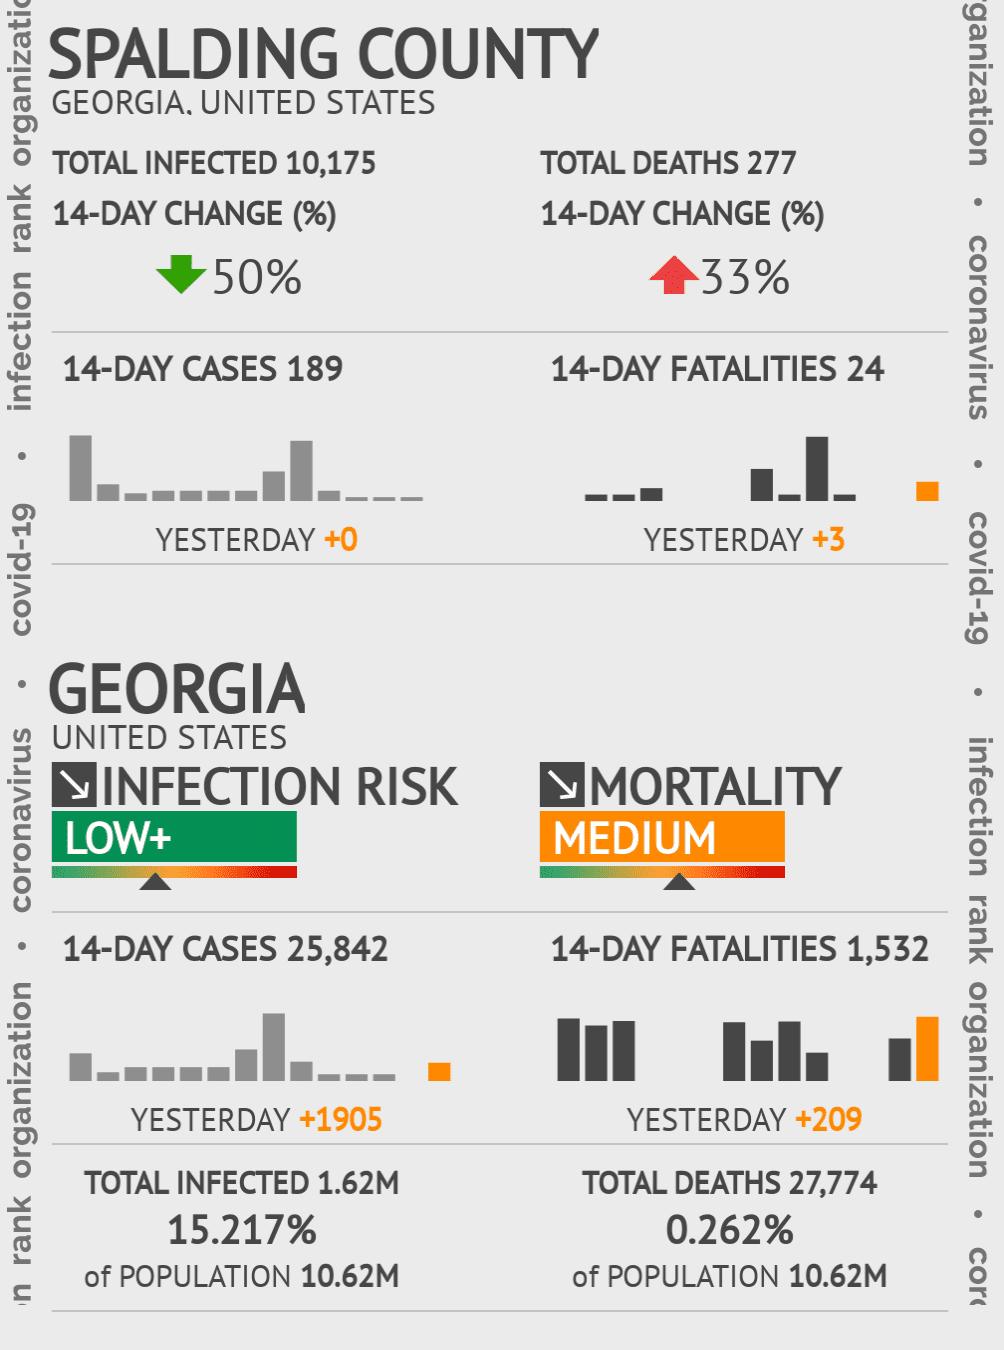 Spalding County Coronavirus Covid-19 Risk of Infection on November 29, 2020